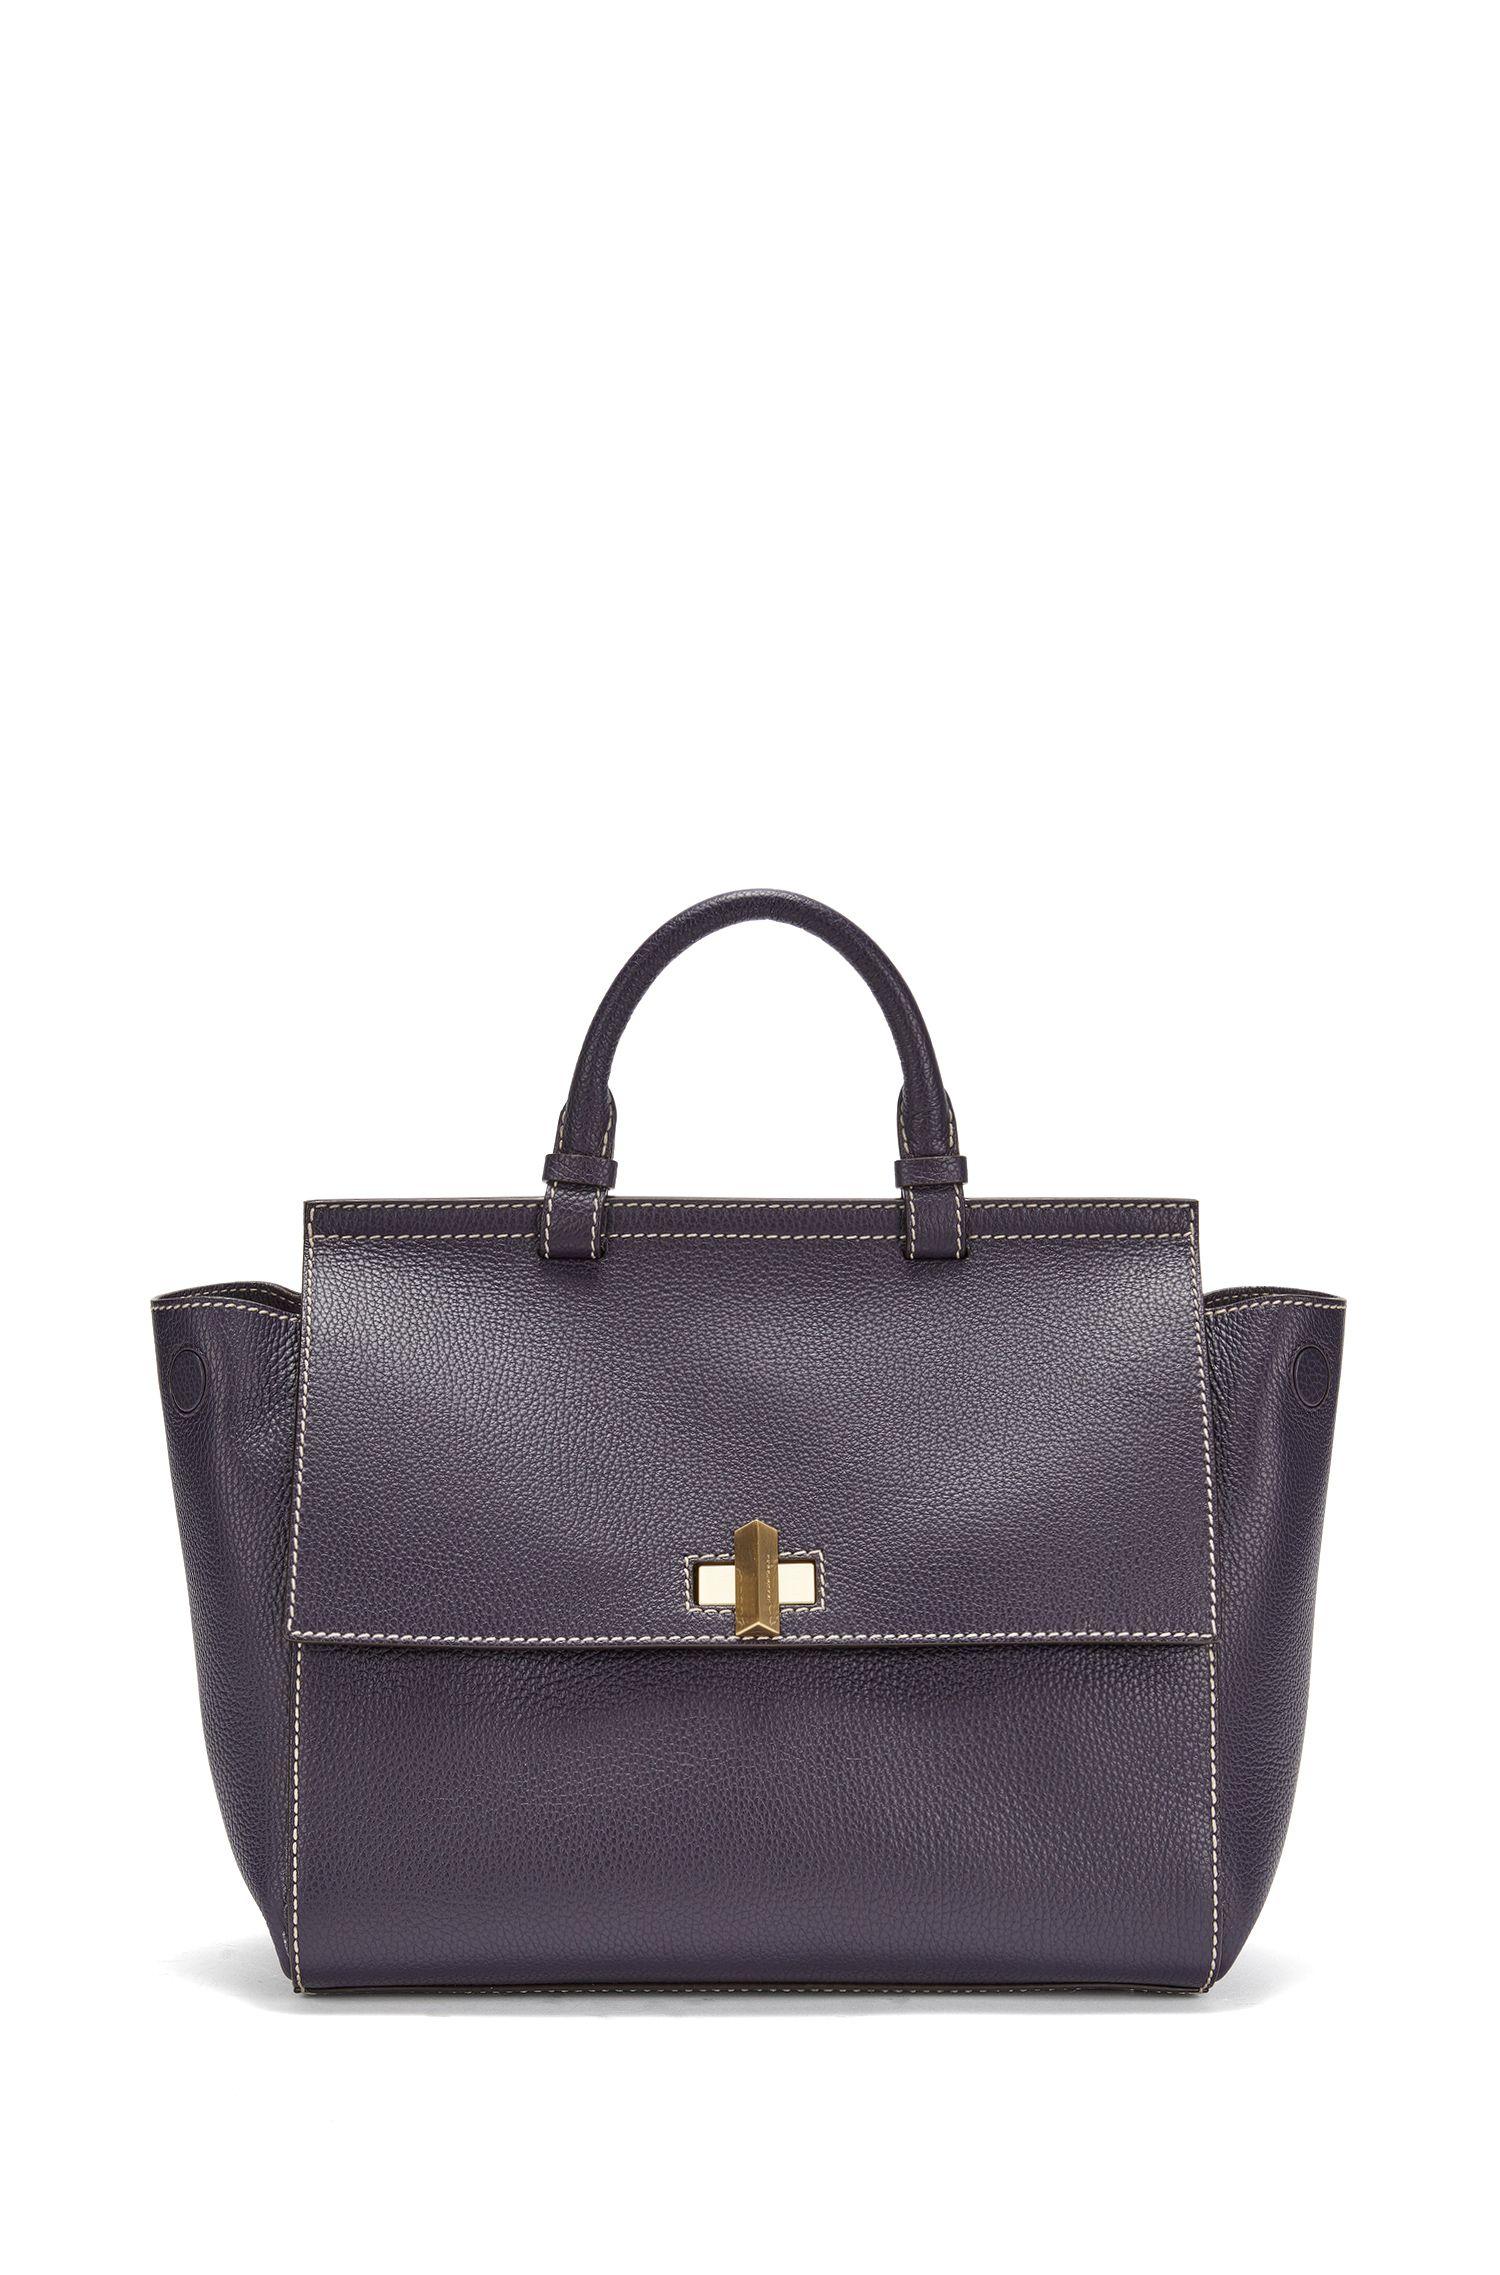 BOSS Bespoke handbag in Italian leather